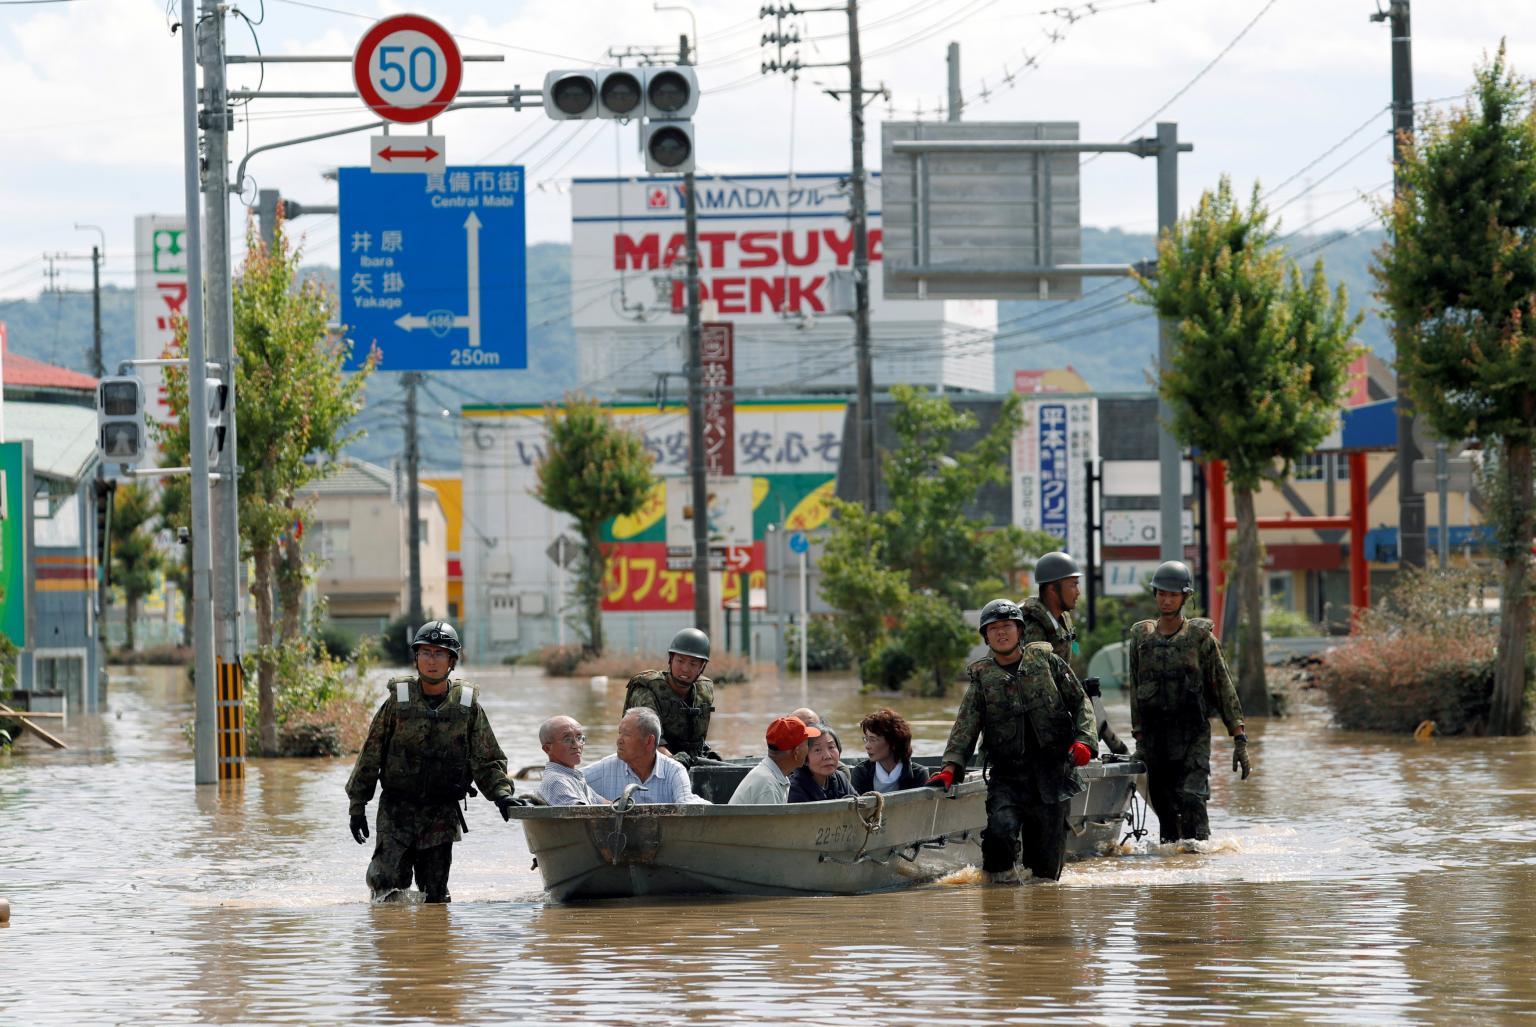 'Unprecedented' rain strands at least 1,000, kills at least 66 in Japan